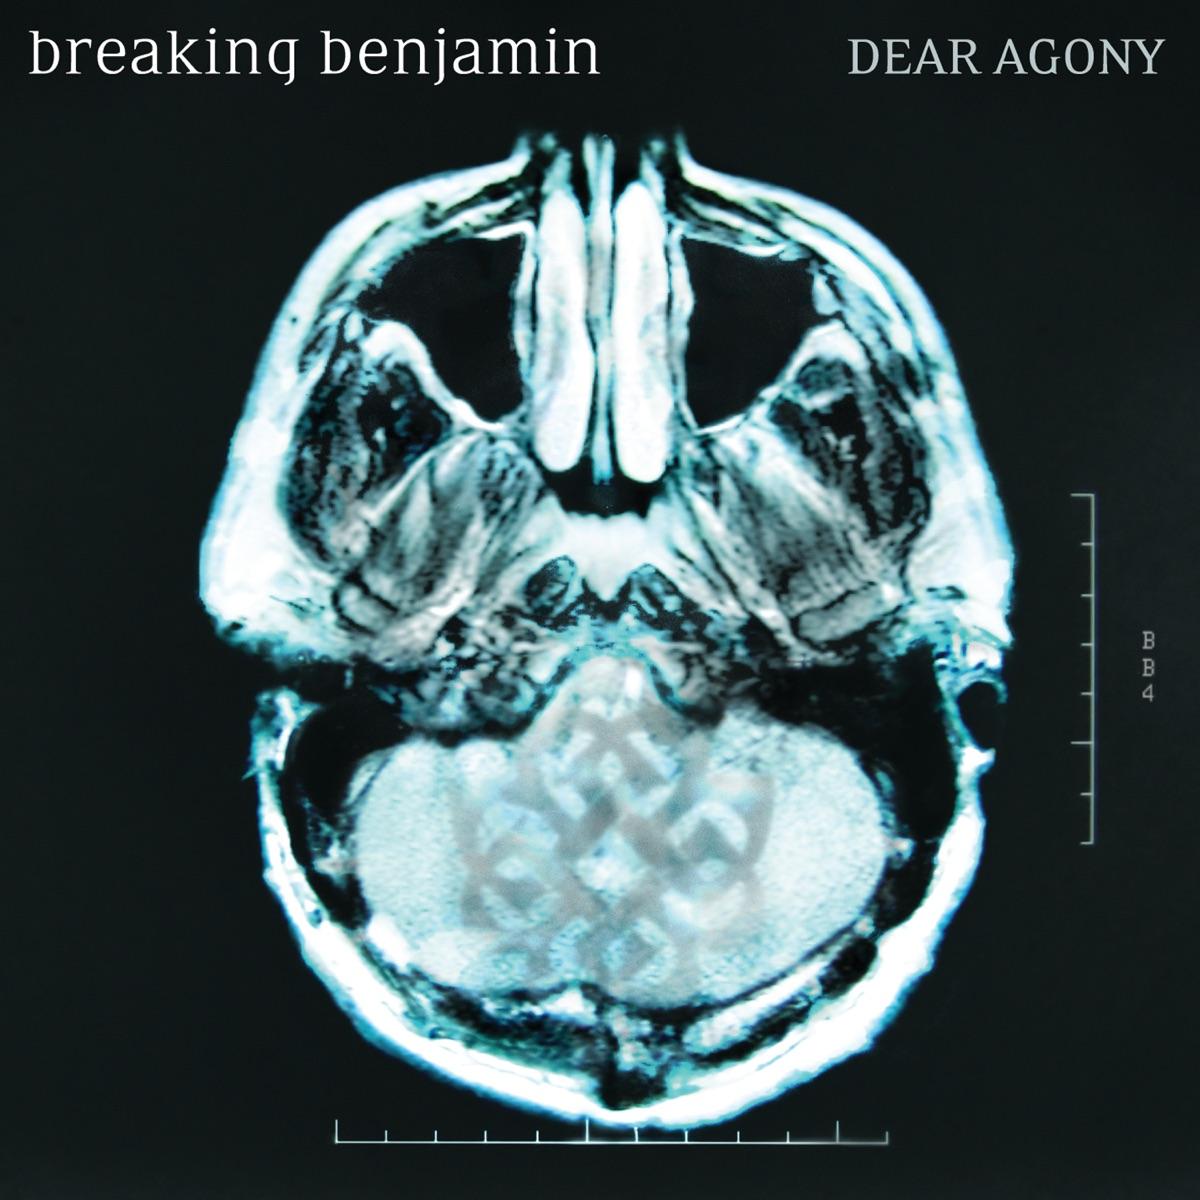 Dear Agony Album Cover by Breaking Benjamin